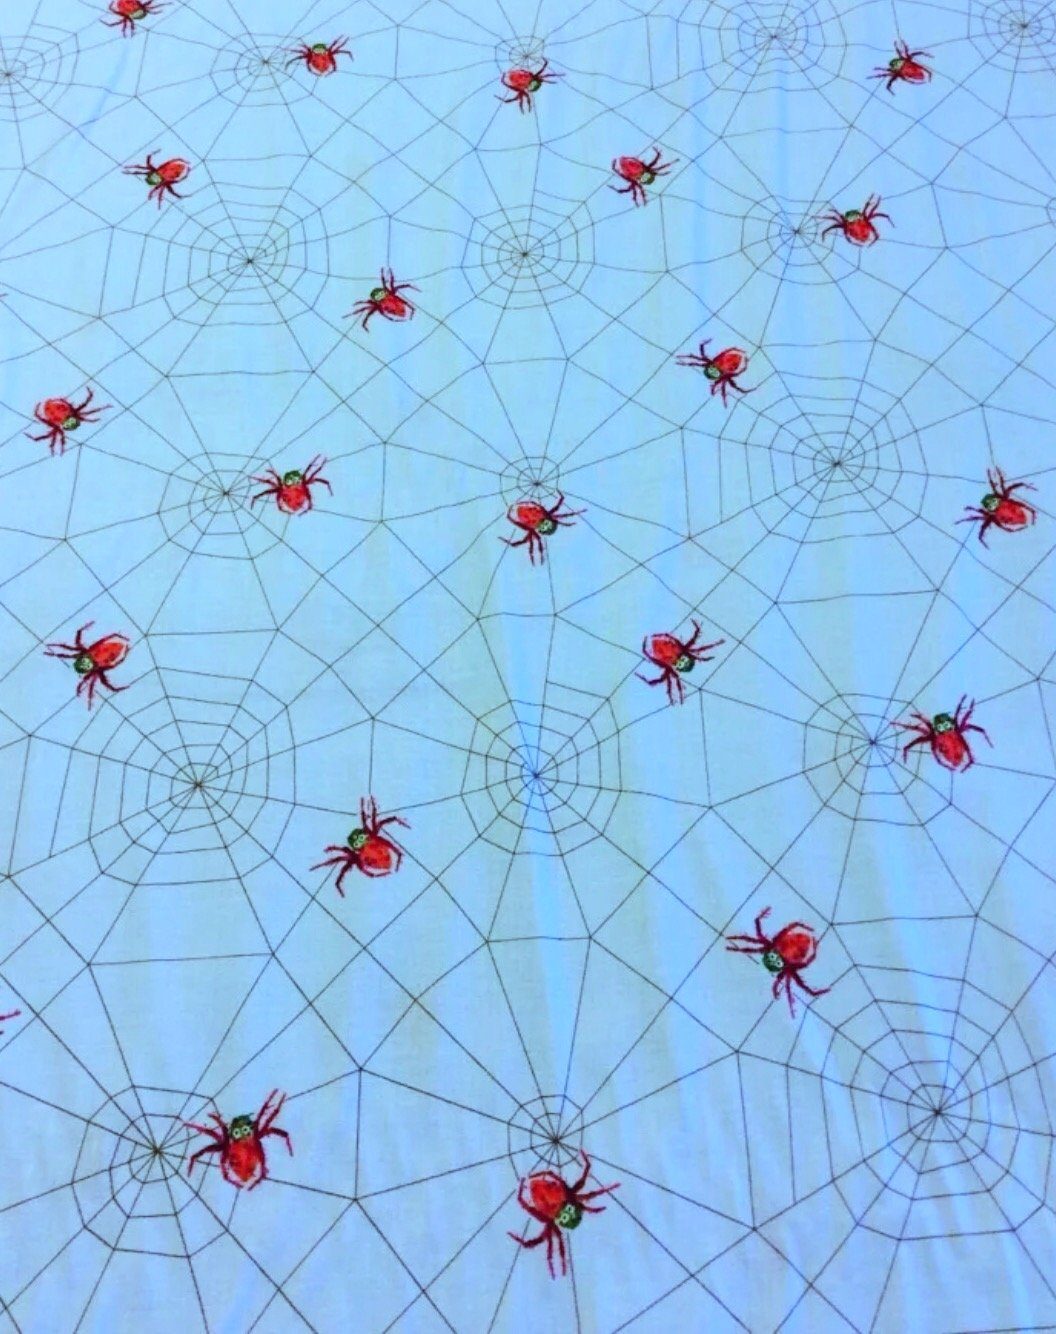 Eric Carle Spider Web Children's Book Retro Quilt Fabric Cotton Fabric Hungry Caterpillar FF26